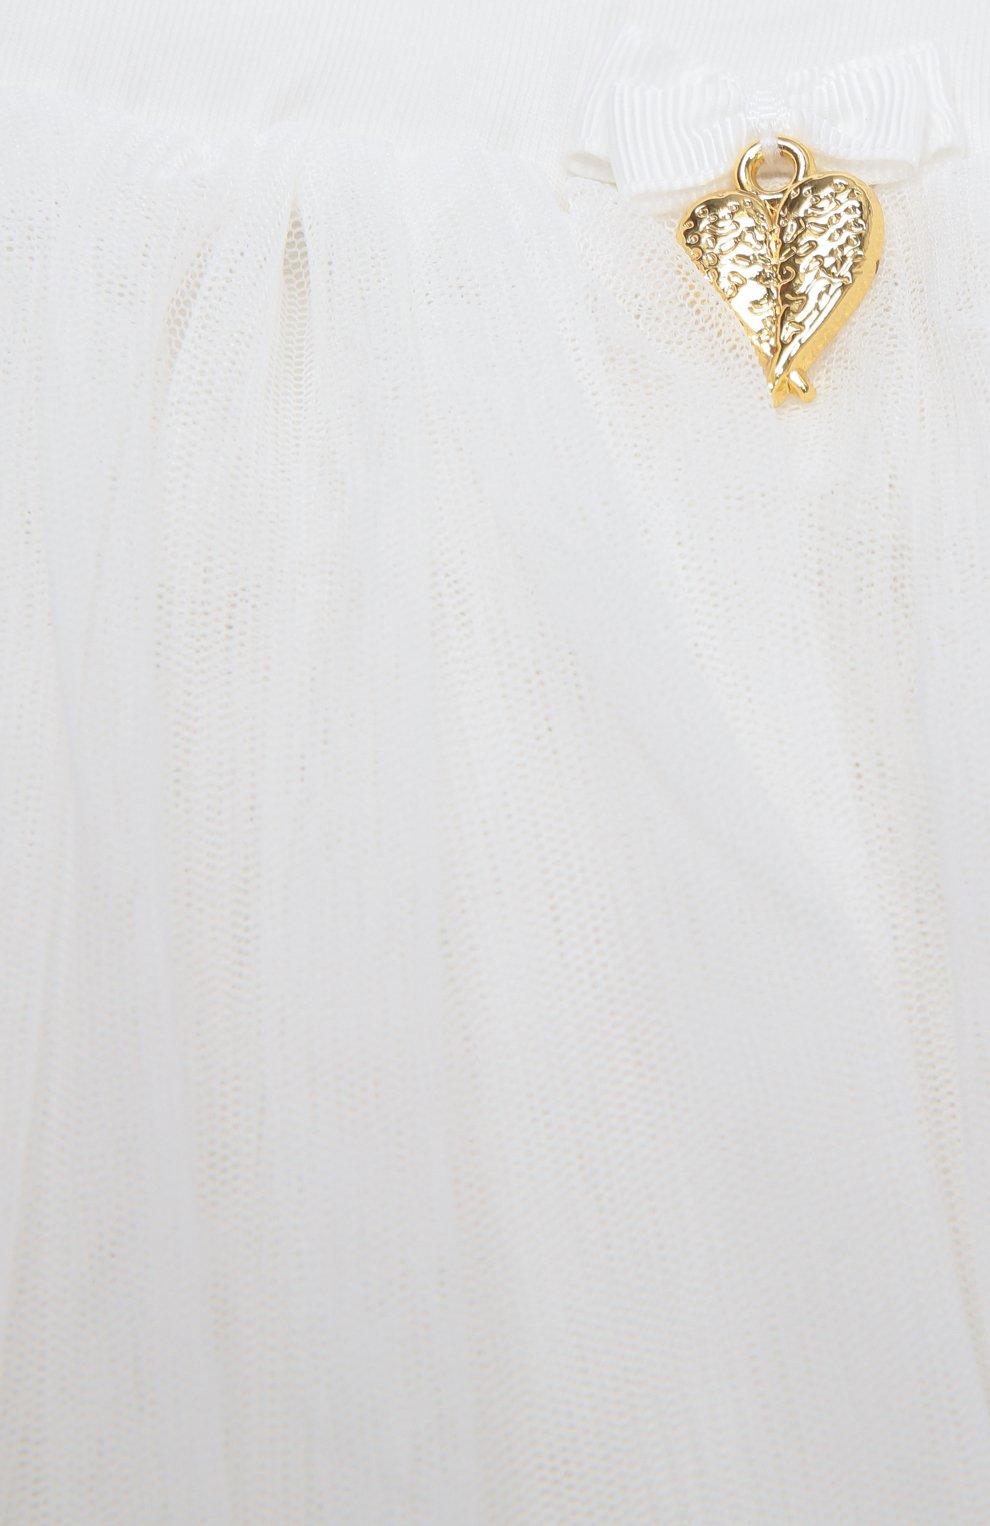 Пышная многоярусная юбка   Фото №2